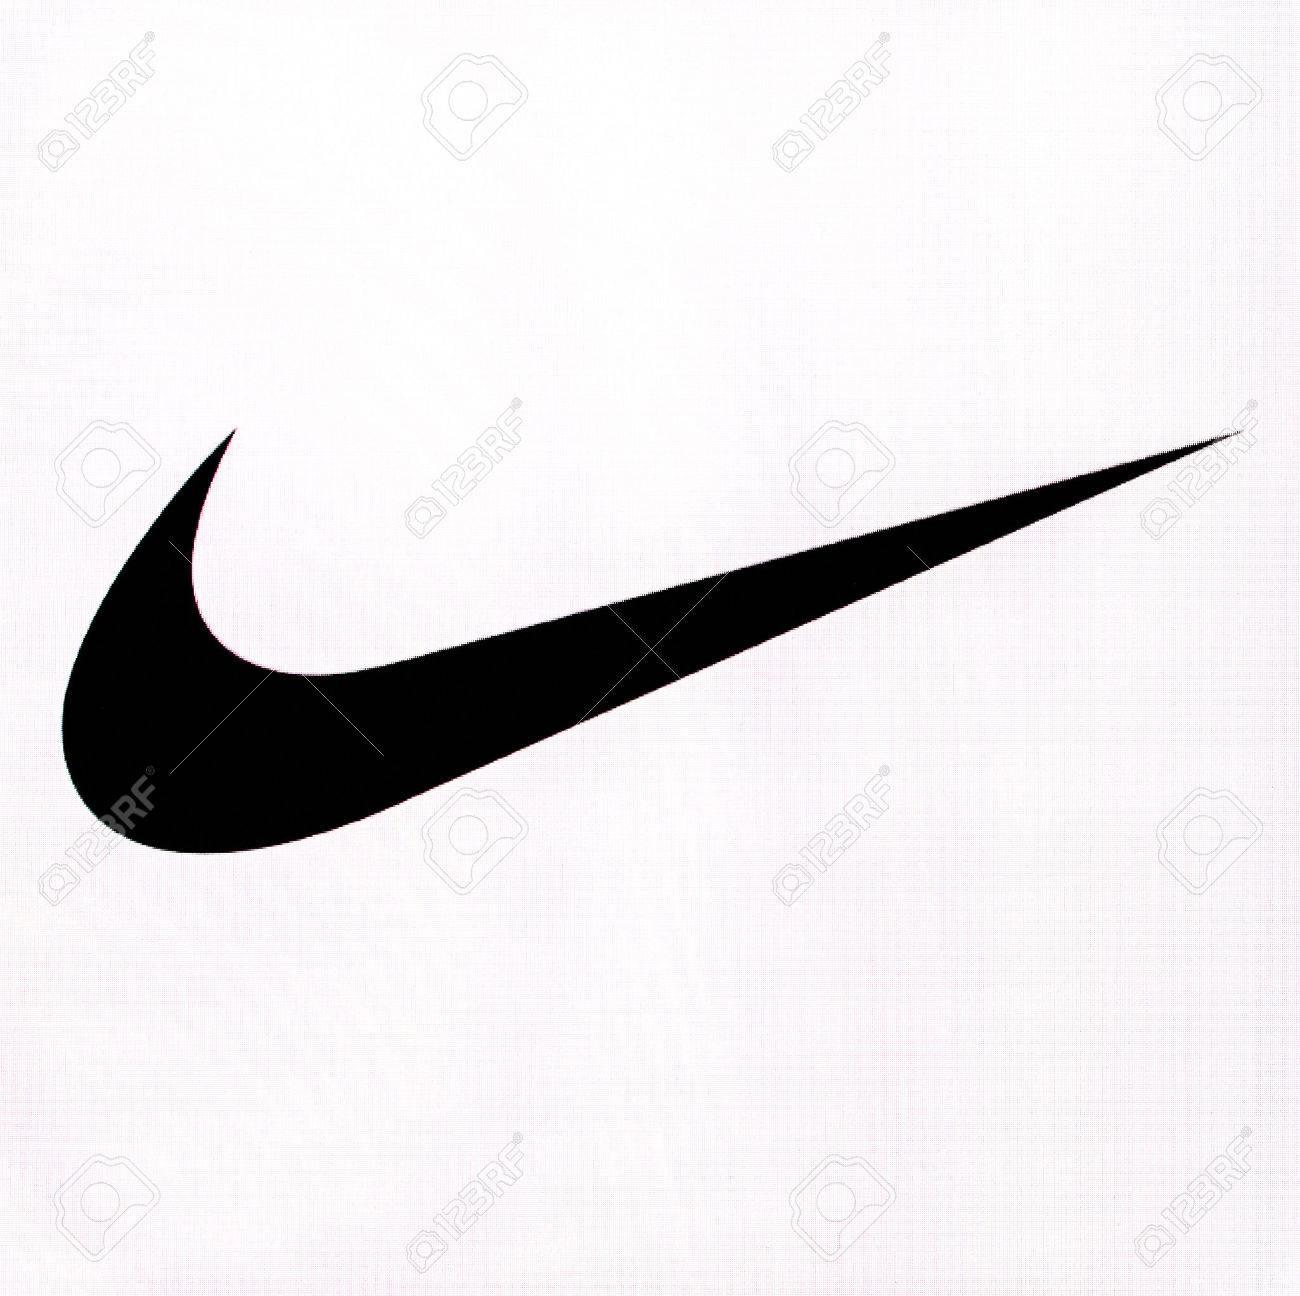 chisinau moldova november 16 2016 he logo of the brand nike rh 123rf com 2000 Nike Flight Symbol Nike Jordan Logo